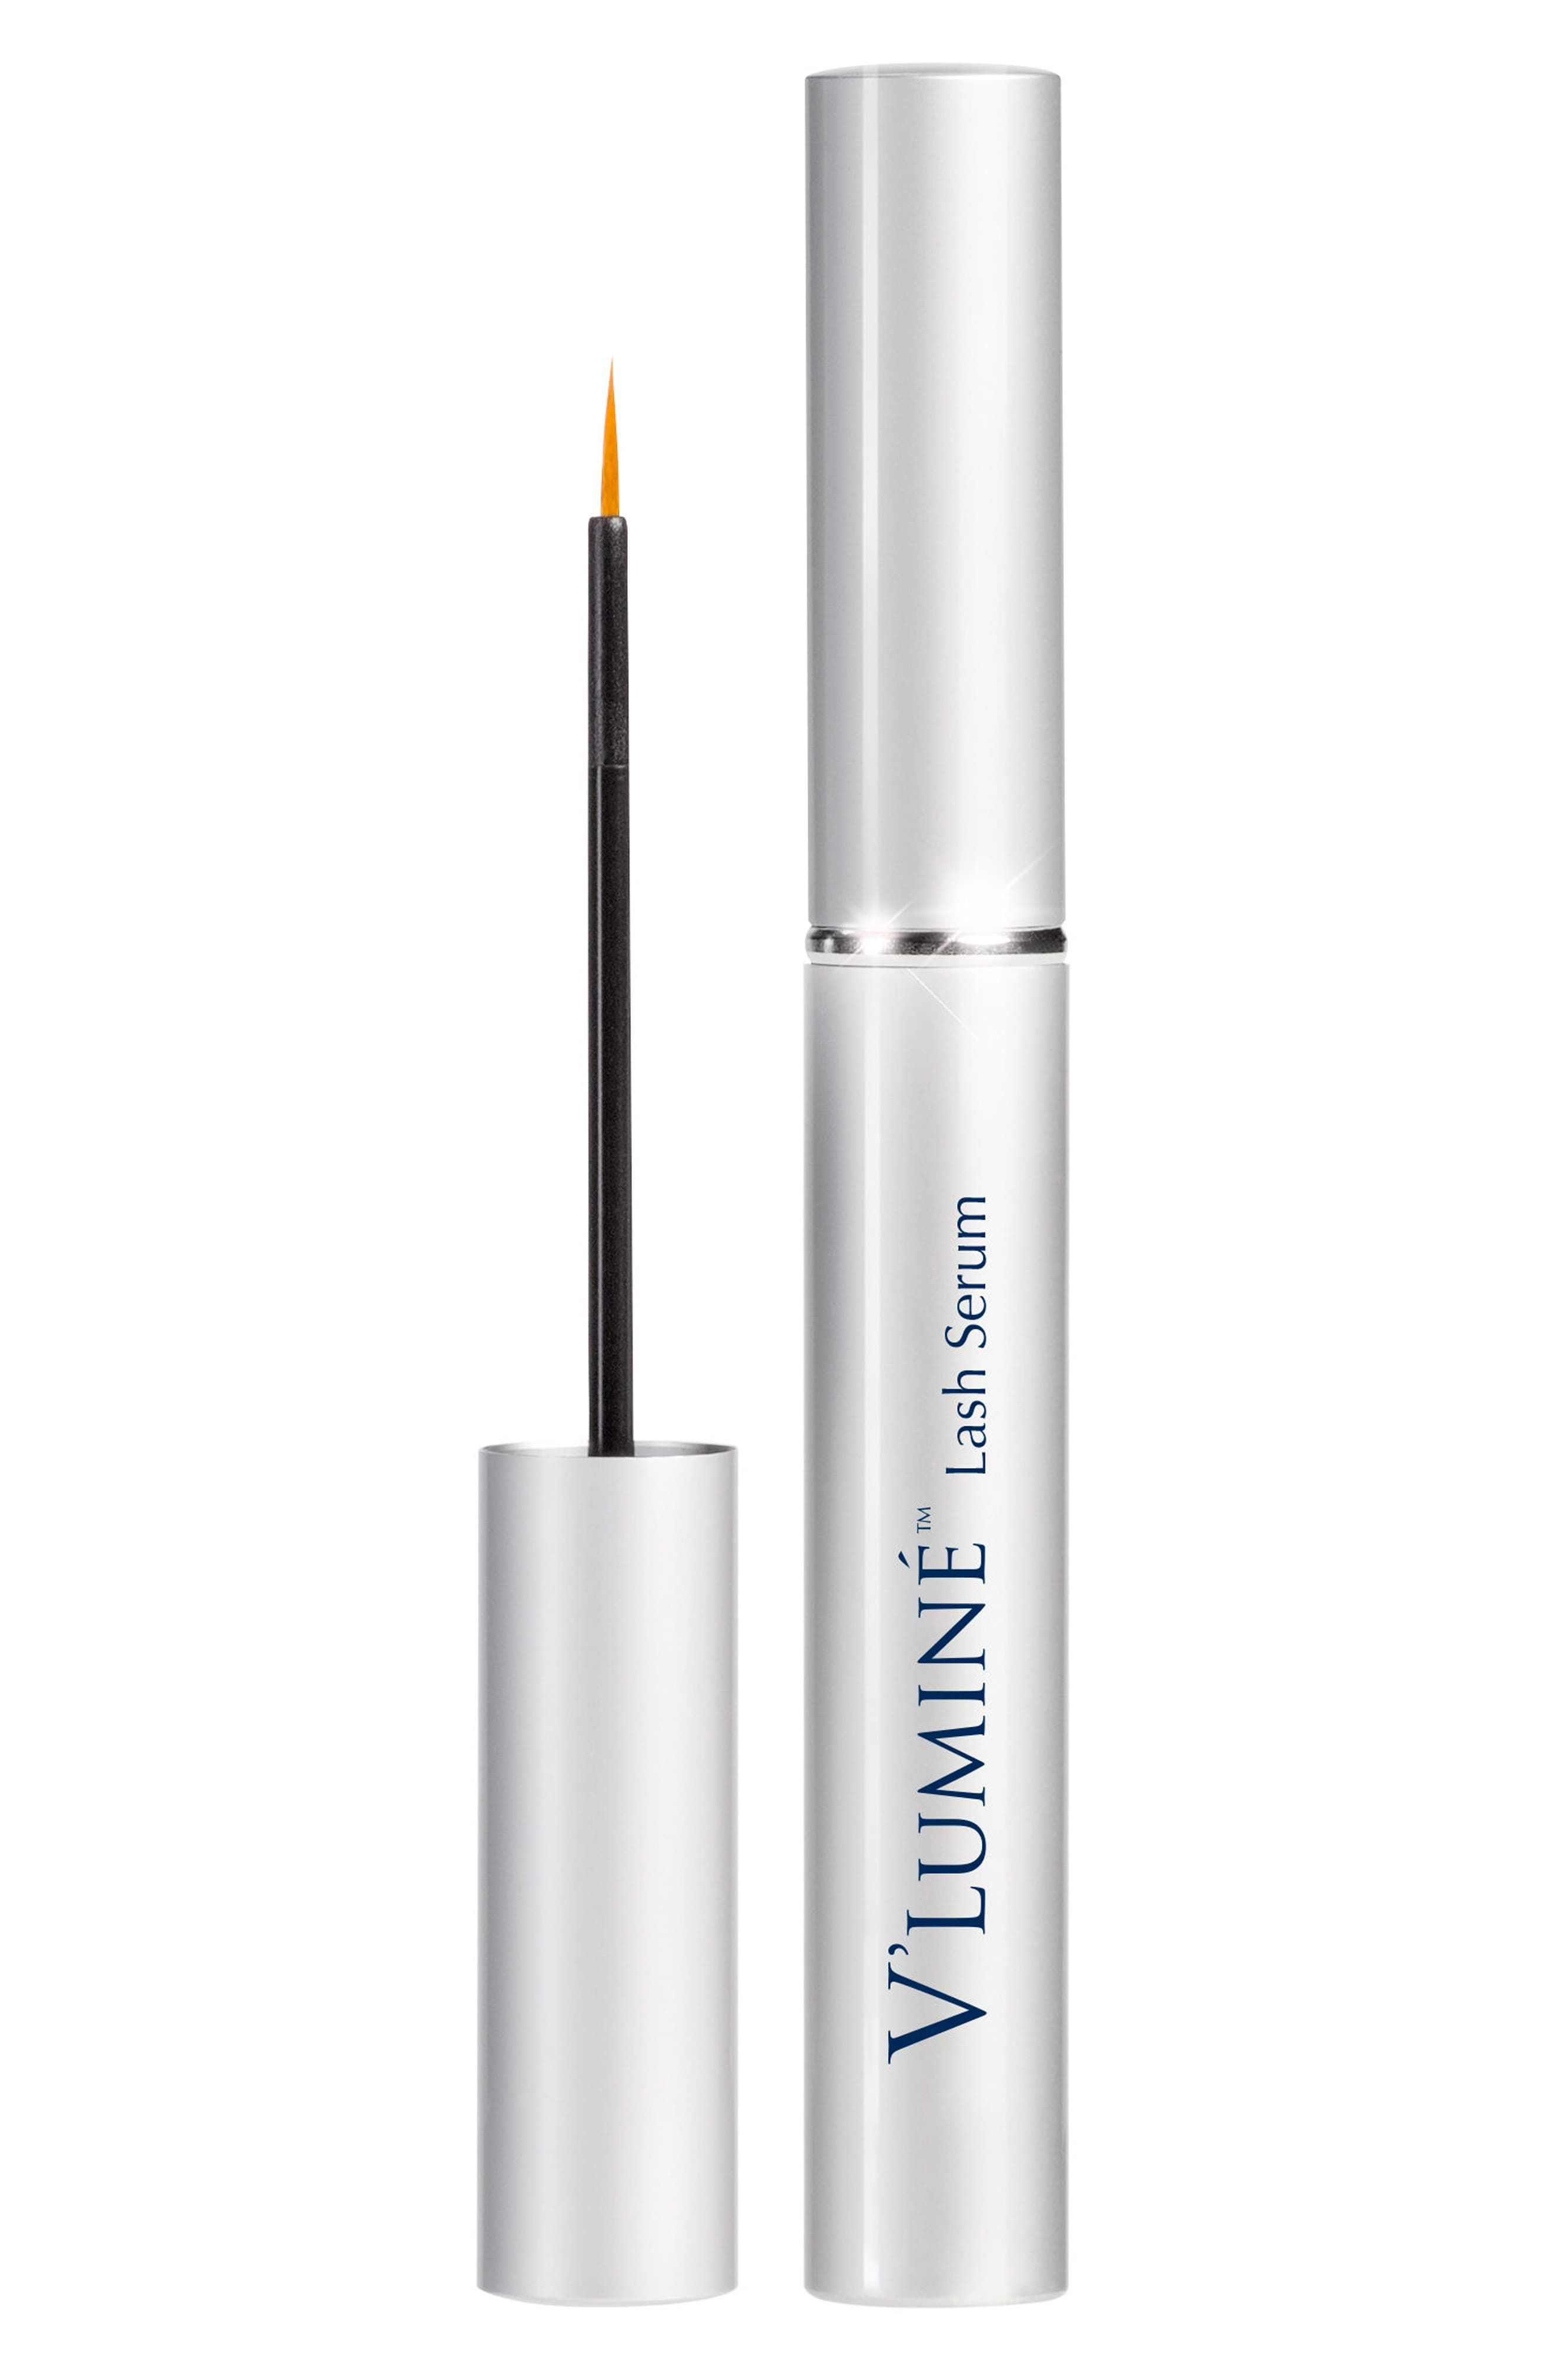 142f16c1650 Revitalash V'Luminé Lash Serum - No Color in 2019 | Products ...